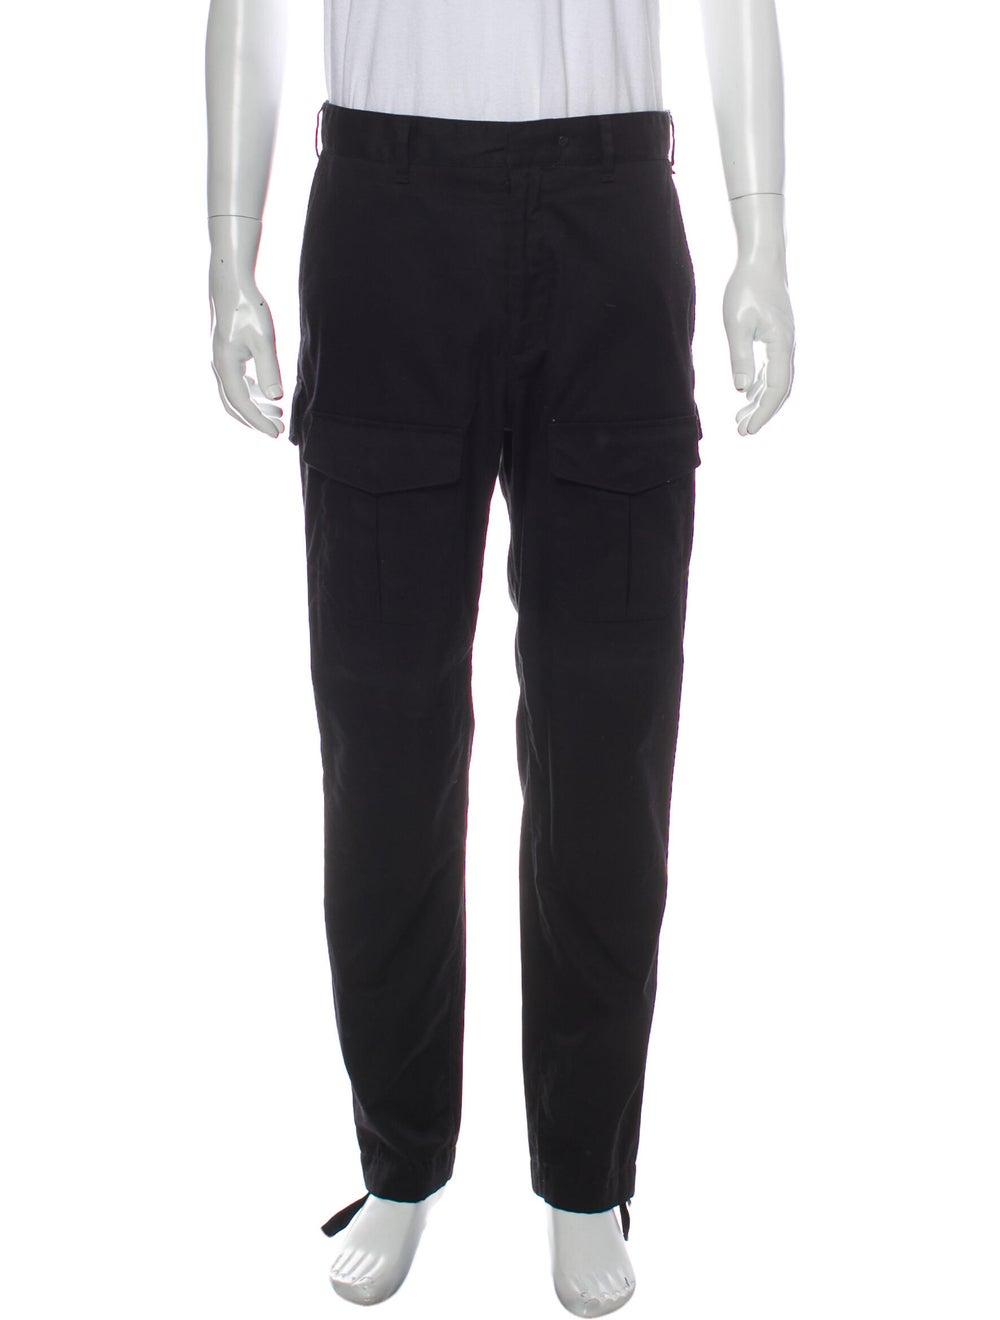 Rag & Bone Cargo Pants Black - image 1